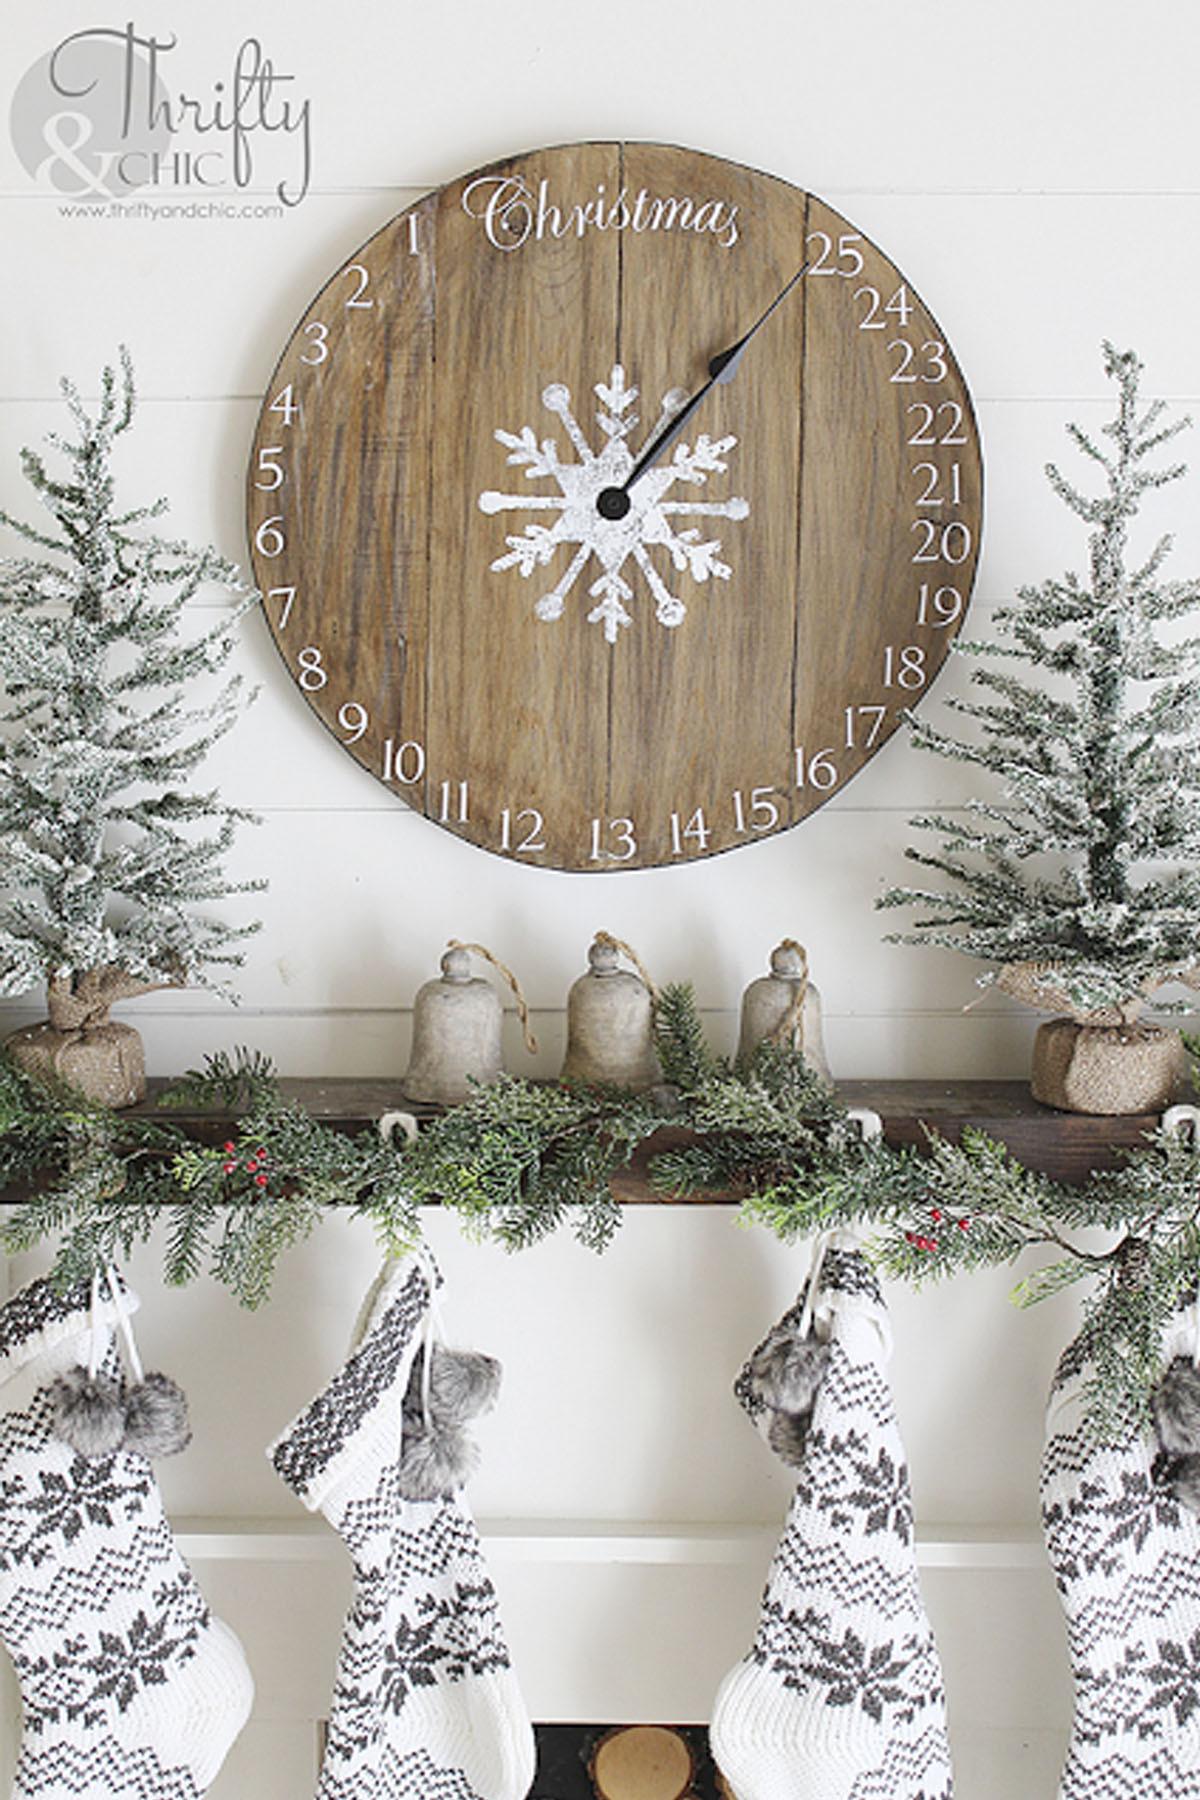 Christmas Wood Art  43 Easy DIY Christmas Decorations Homemade Ideas for